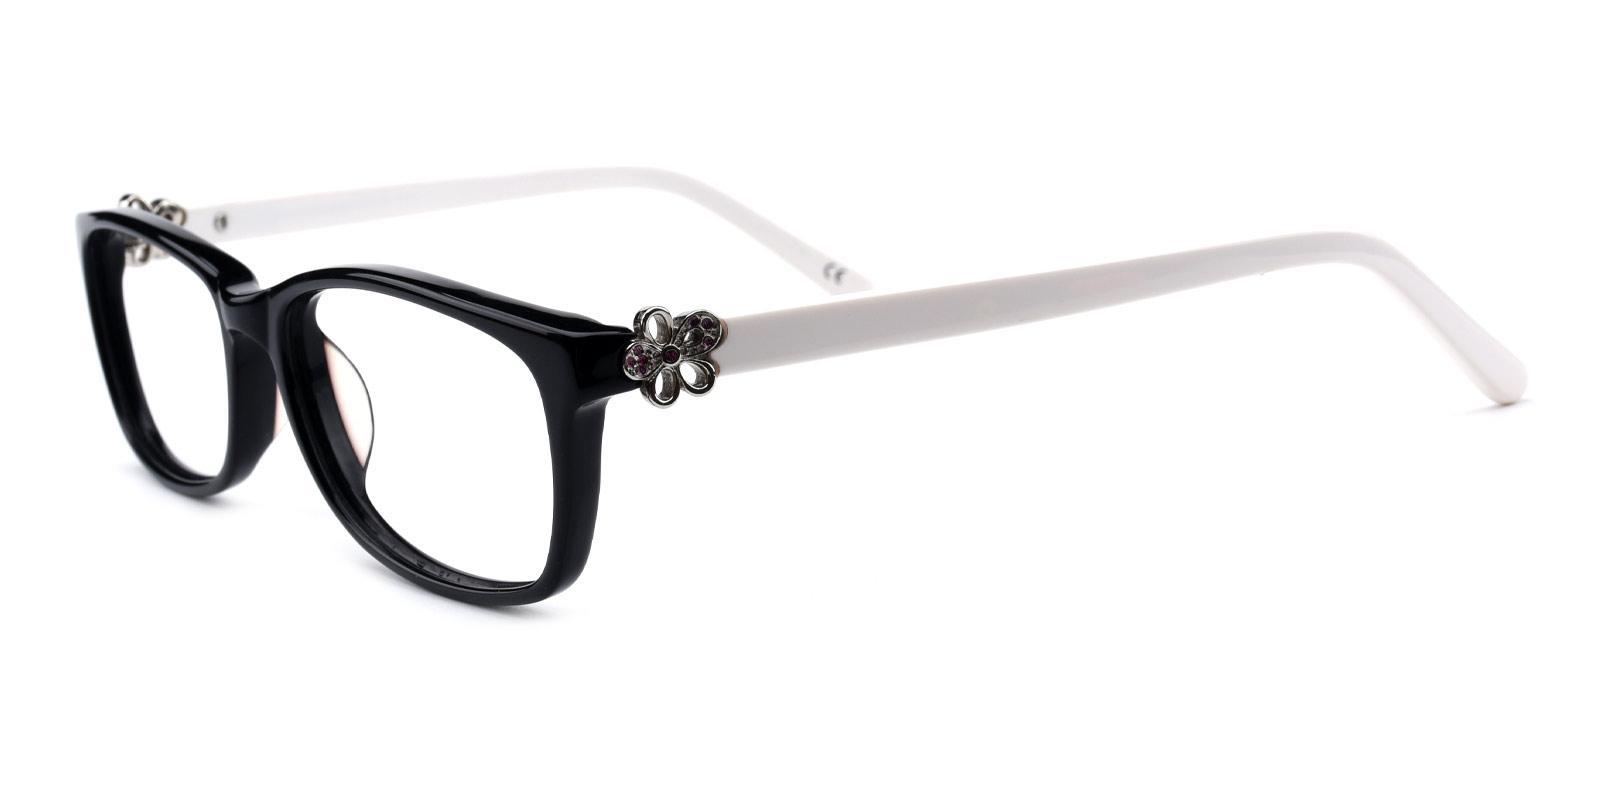 Rosemary-White-Rectangle-TR-Eyeglasses-additional1